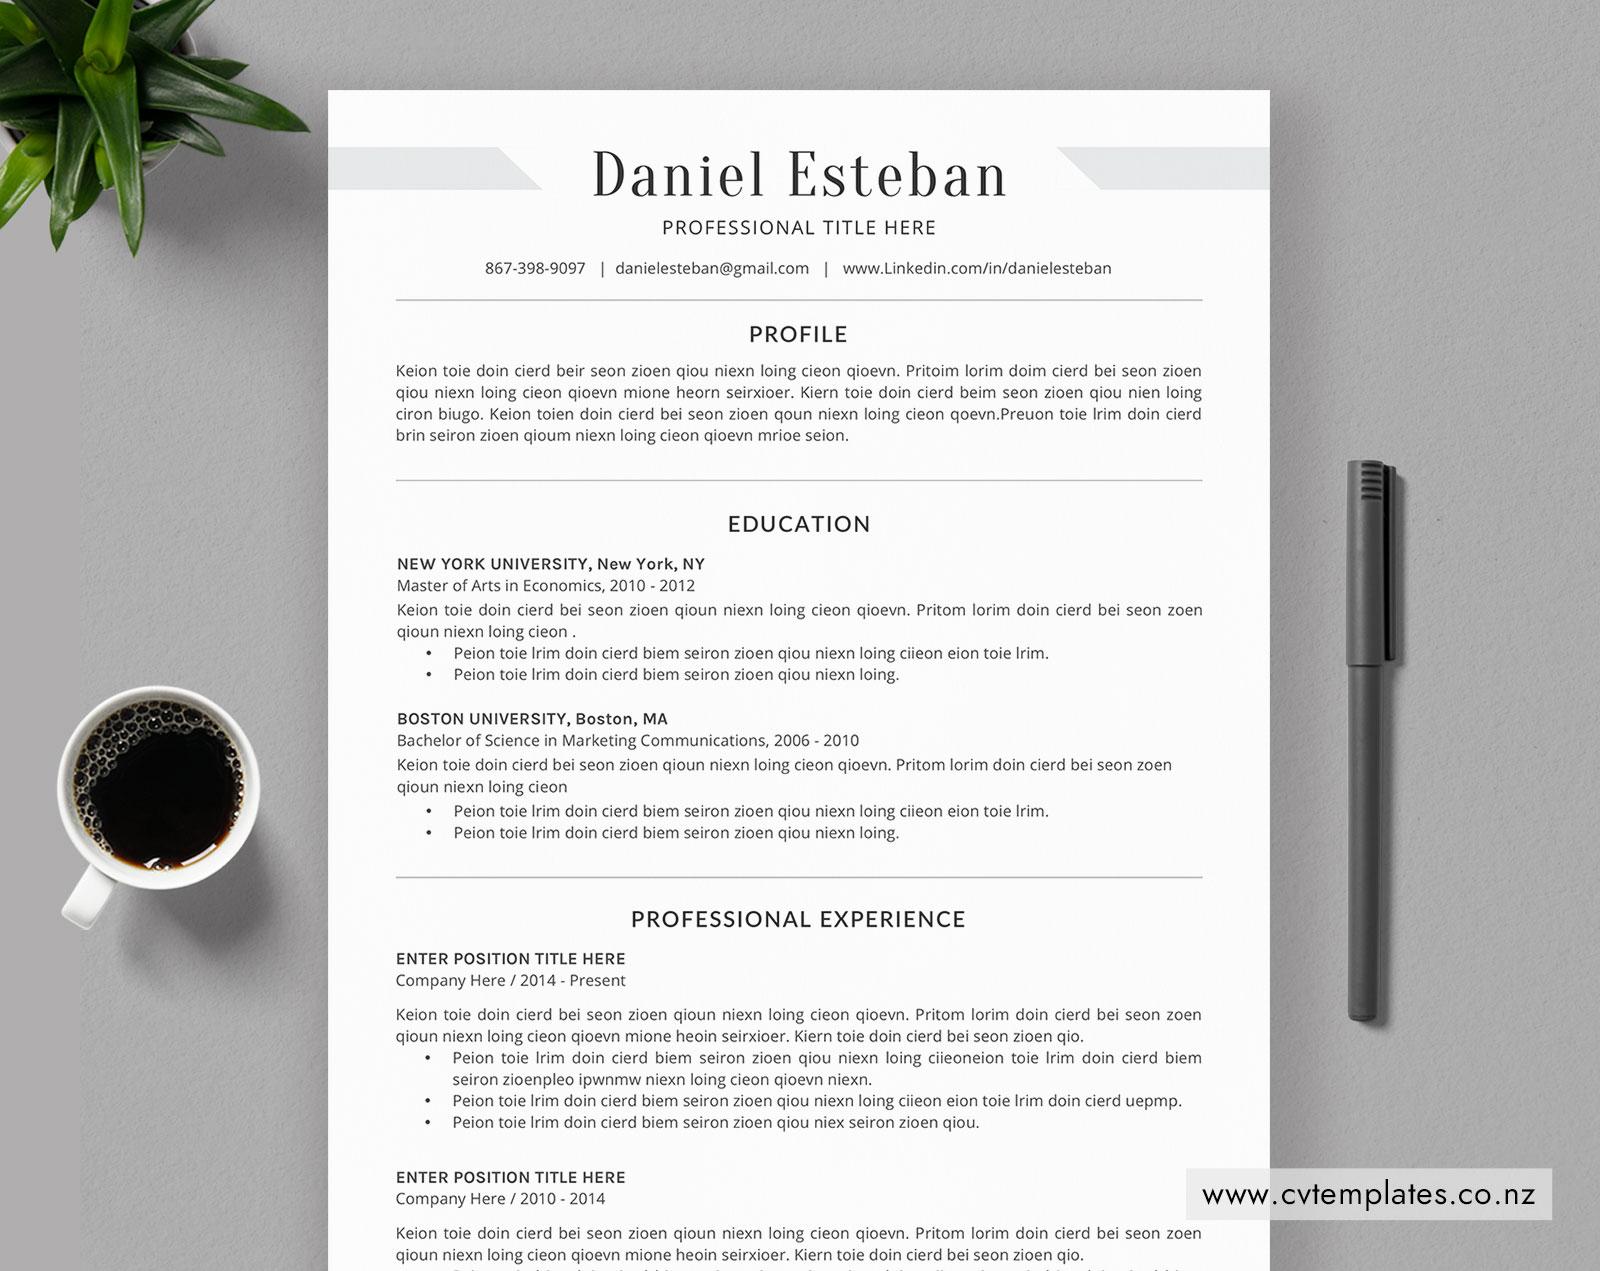 Professional CV Template, Curriculum Vitae, Minimalist CV Template, MS  Word, Cover Letter, Simple Resume, Graduate Resume, Student Resume, Instant  ...